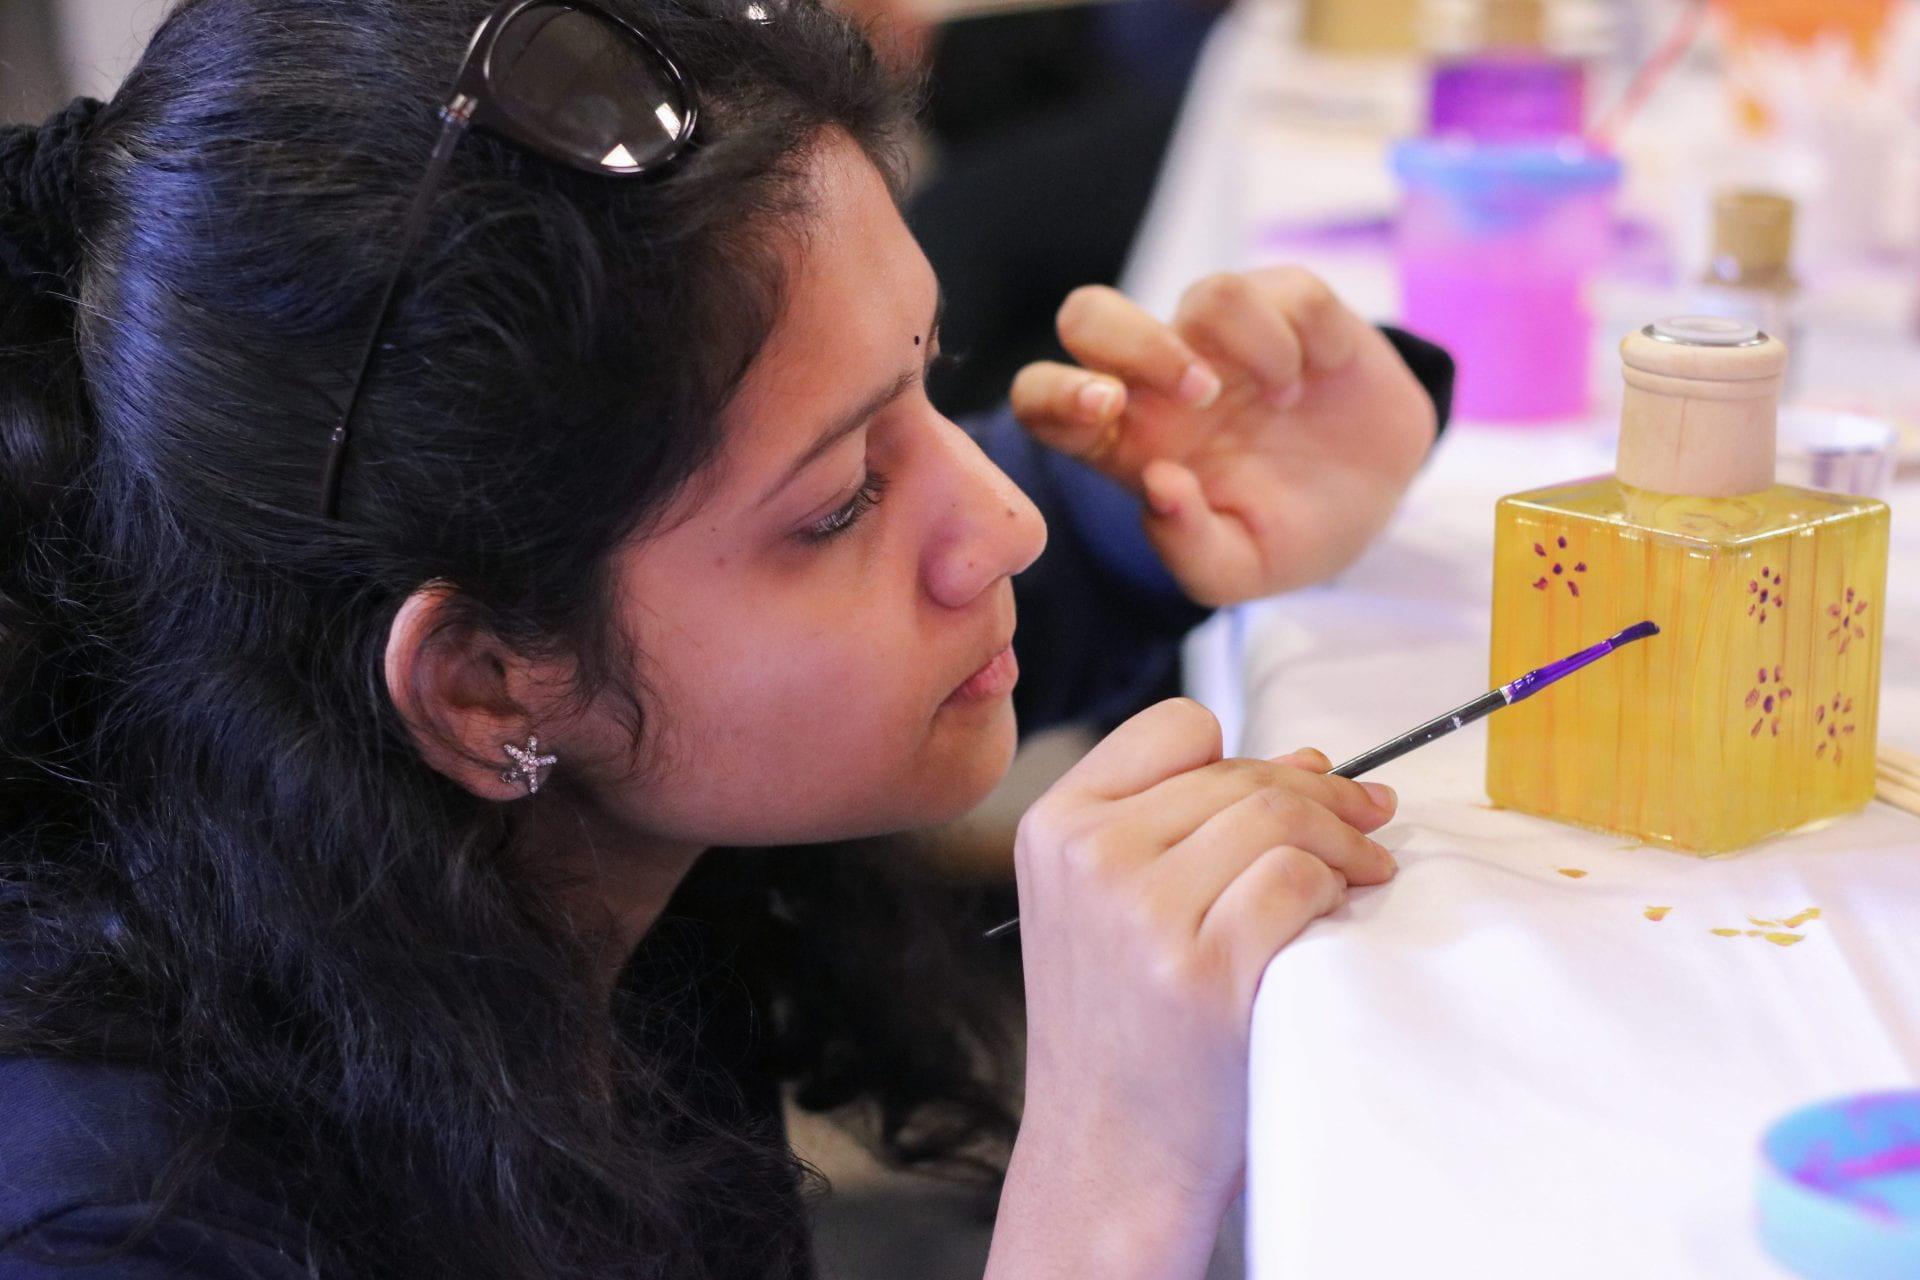 Student paints oil diffuser at USC Celebrates Diwali event.